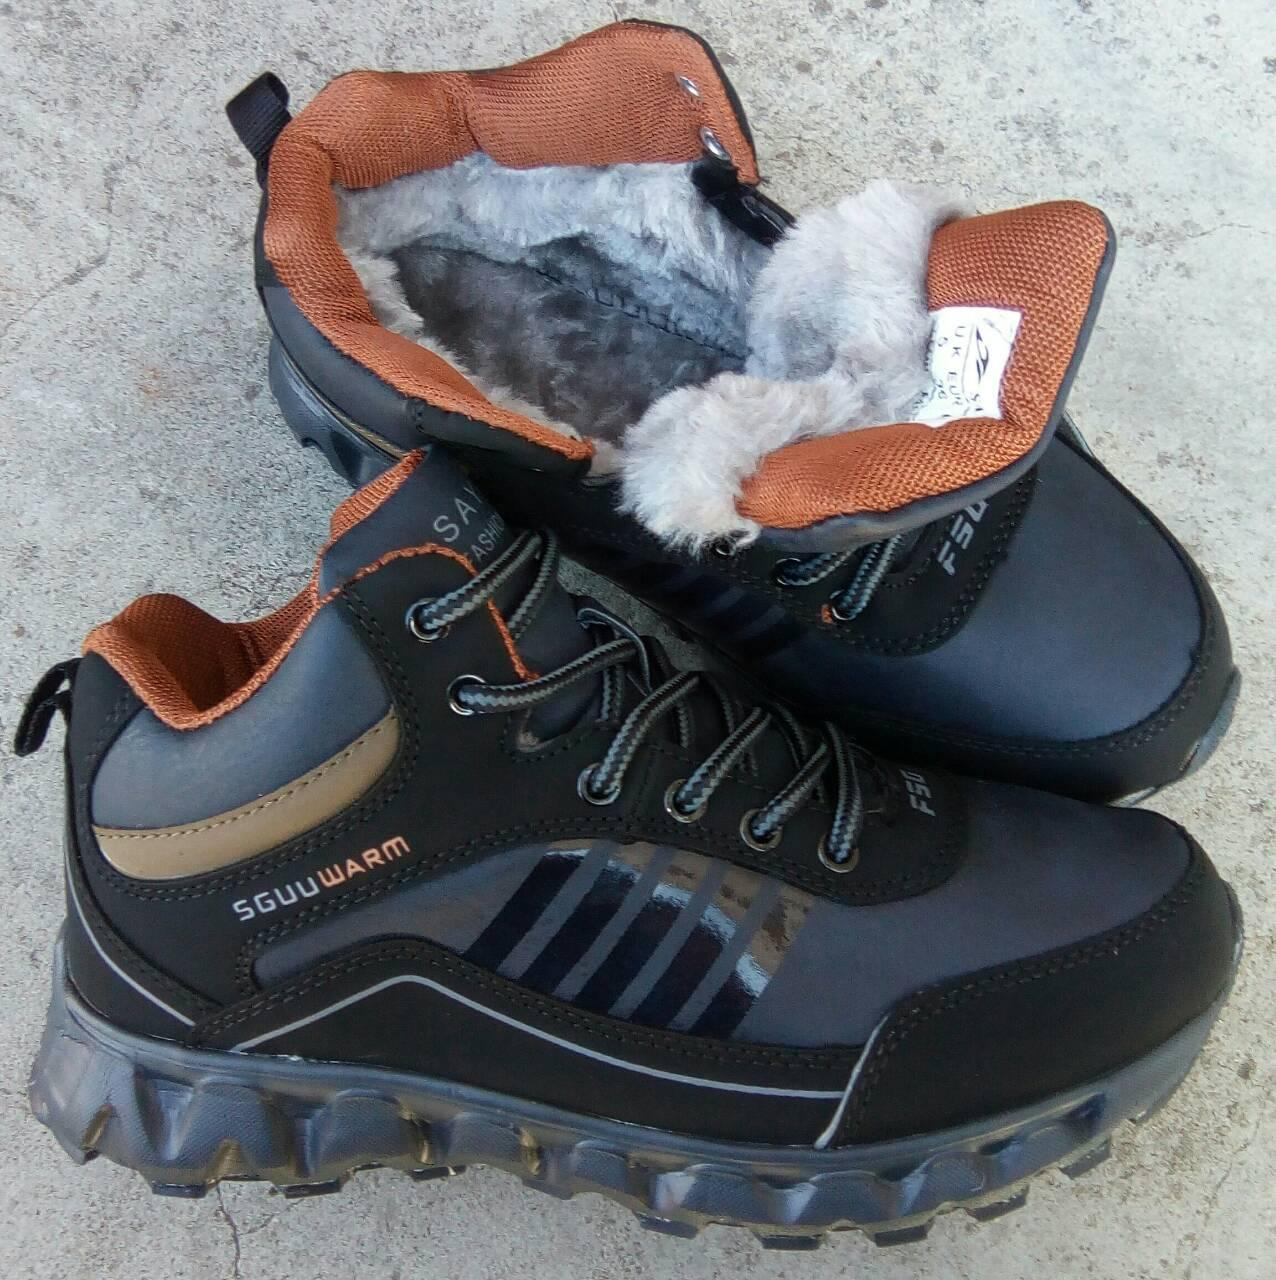 65b47f8d Ботинки кроссовки зимние Sayota р. 36-41, цена 695 грн., купить Бильмакский  район — Prom.ua (ID#809065066)